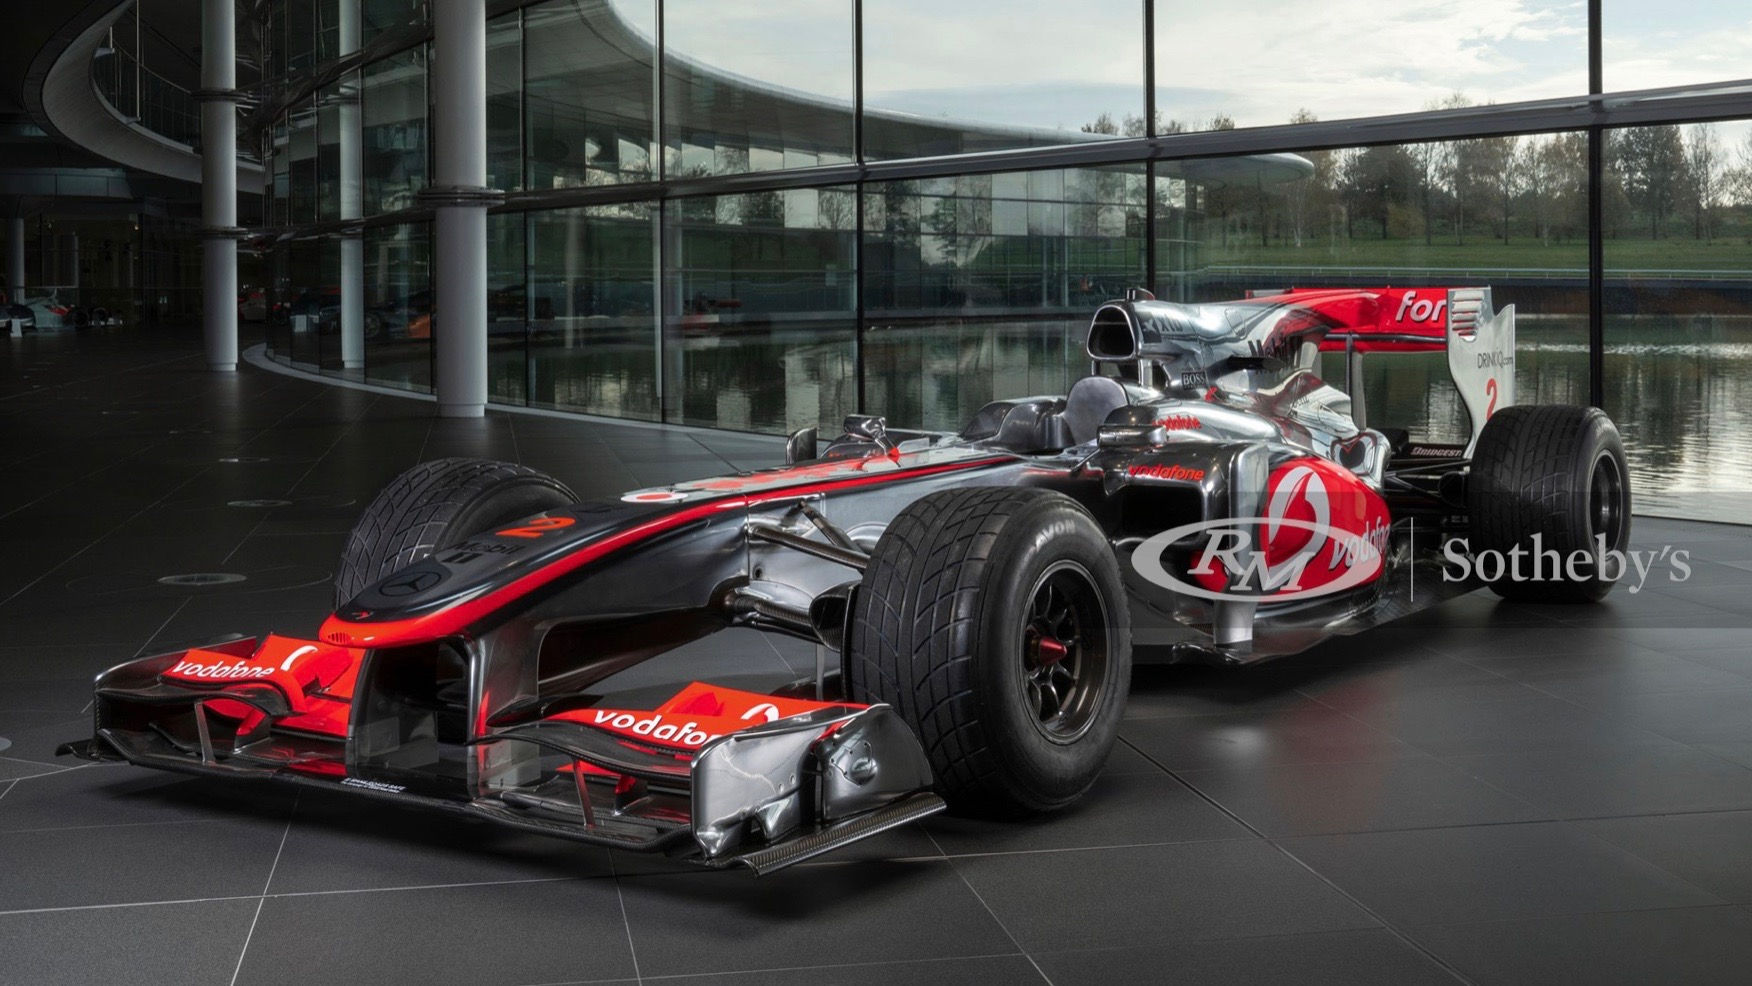 Lewis Hamilton's GP winning McLaren MP4-25A F1 car is for sale